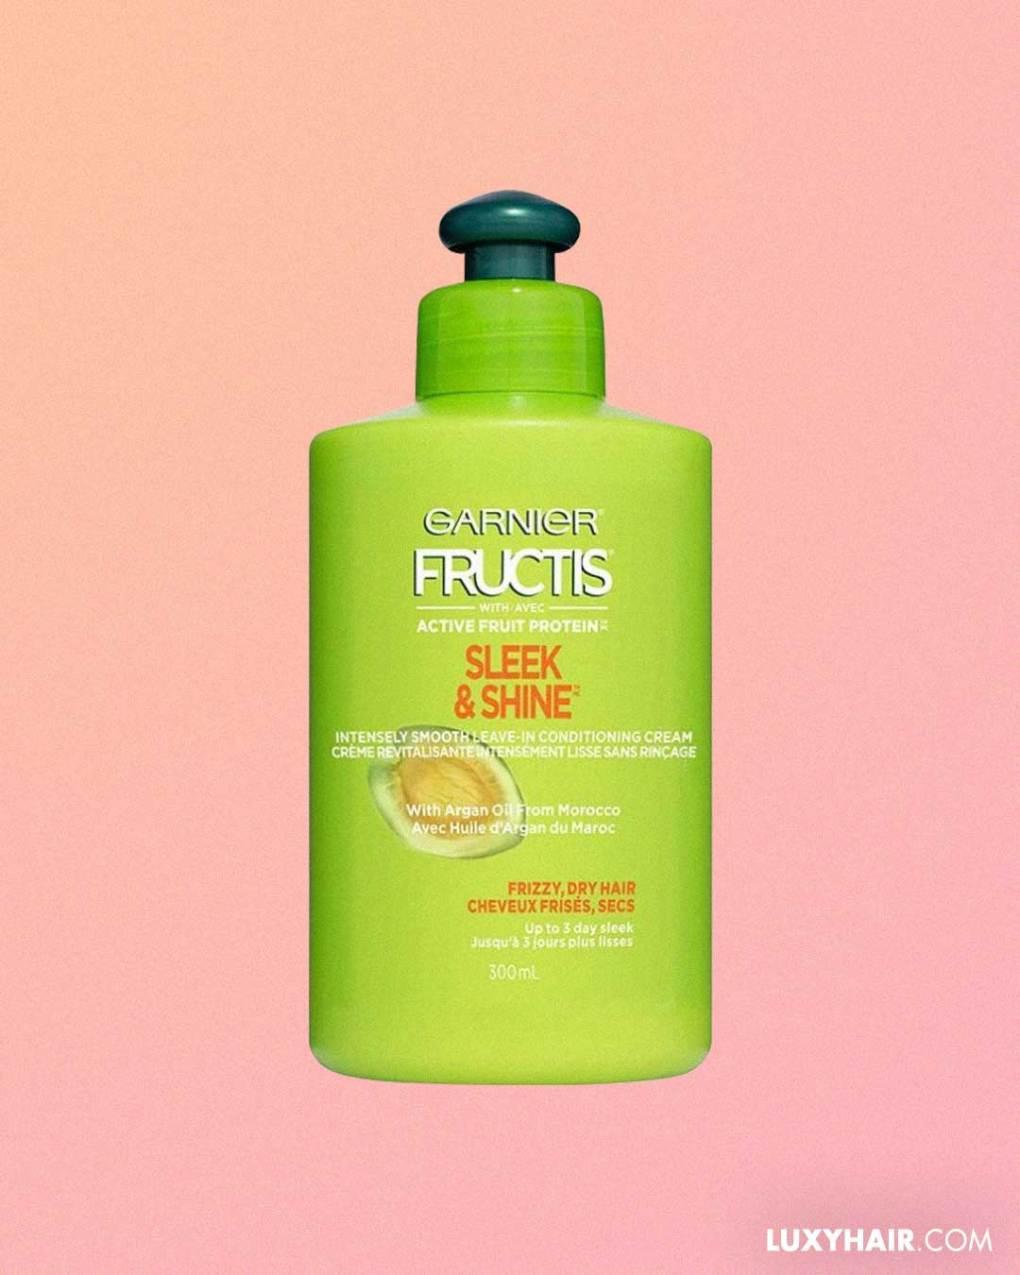 GArnier Fructis Sleek and Shine